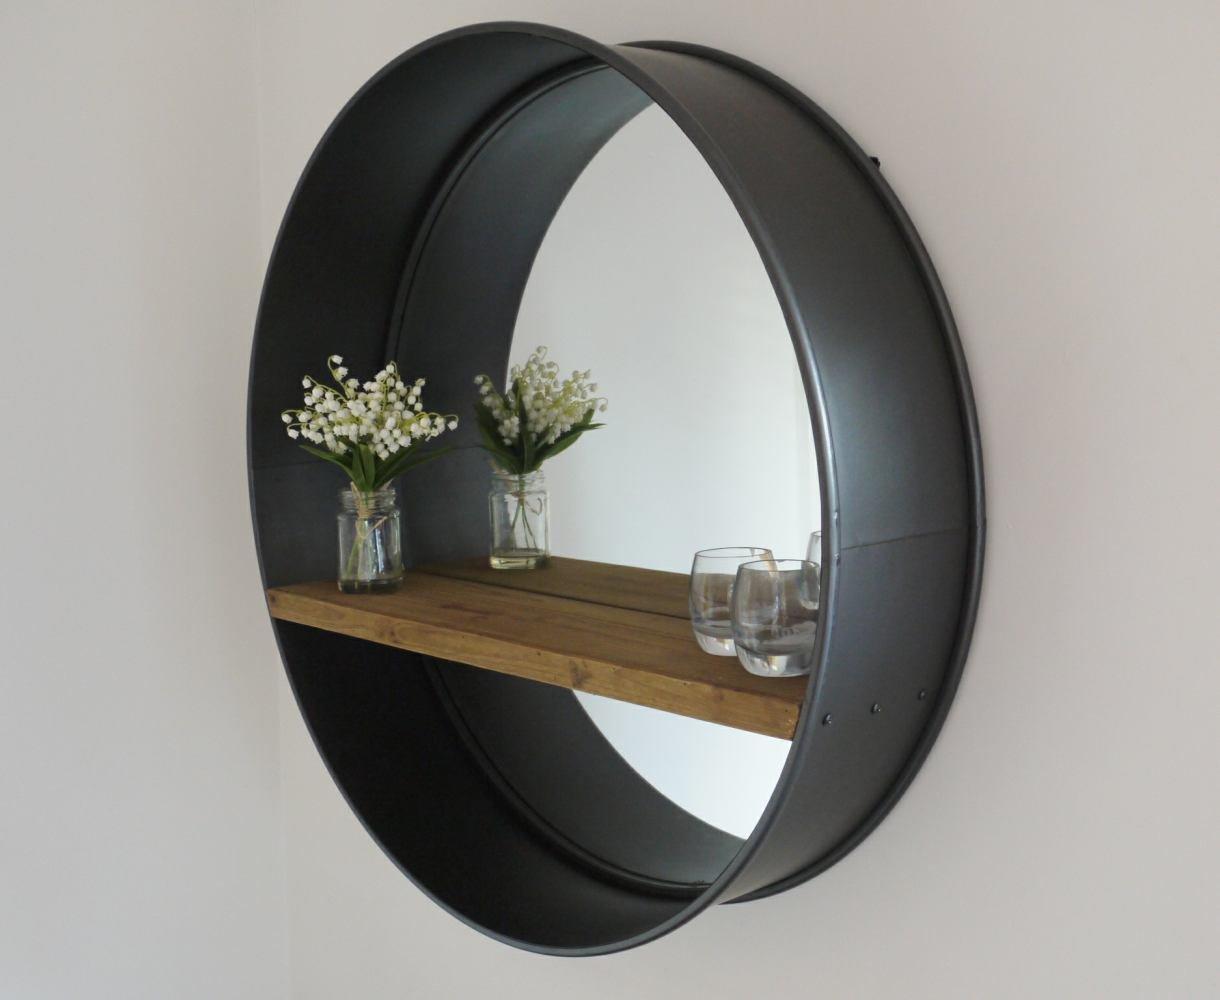 Retro Industrial Round Mirror With Shelf Amazoncouk Kitchen Home